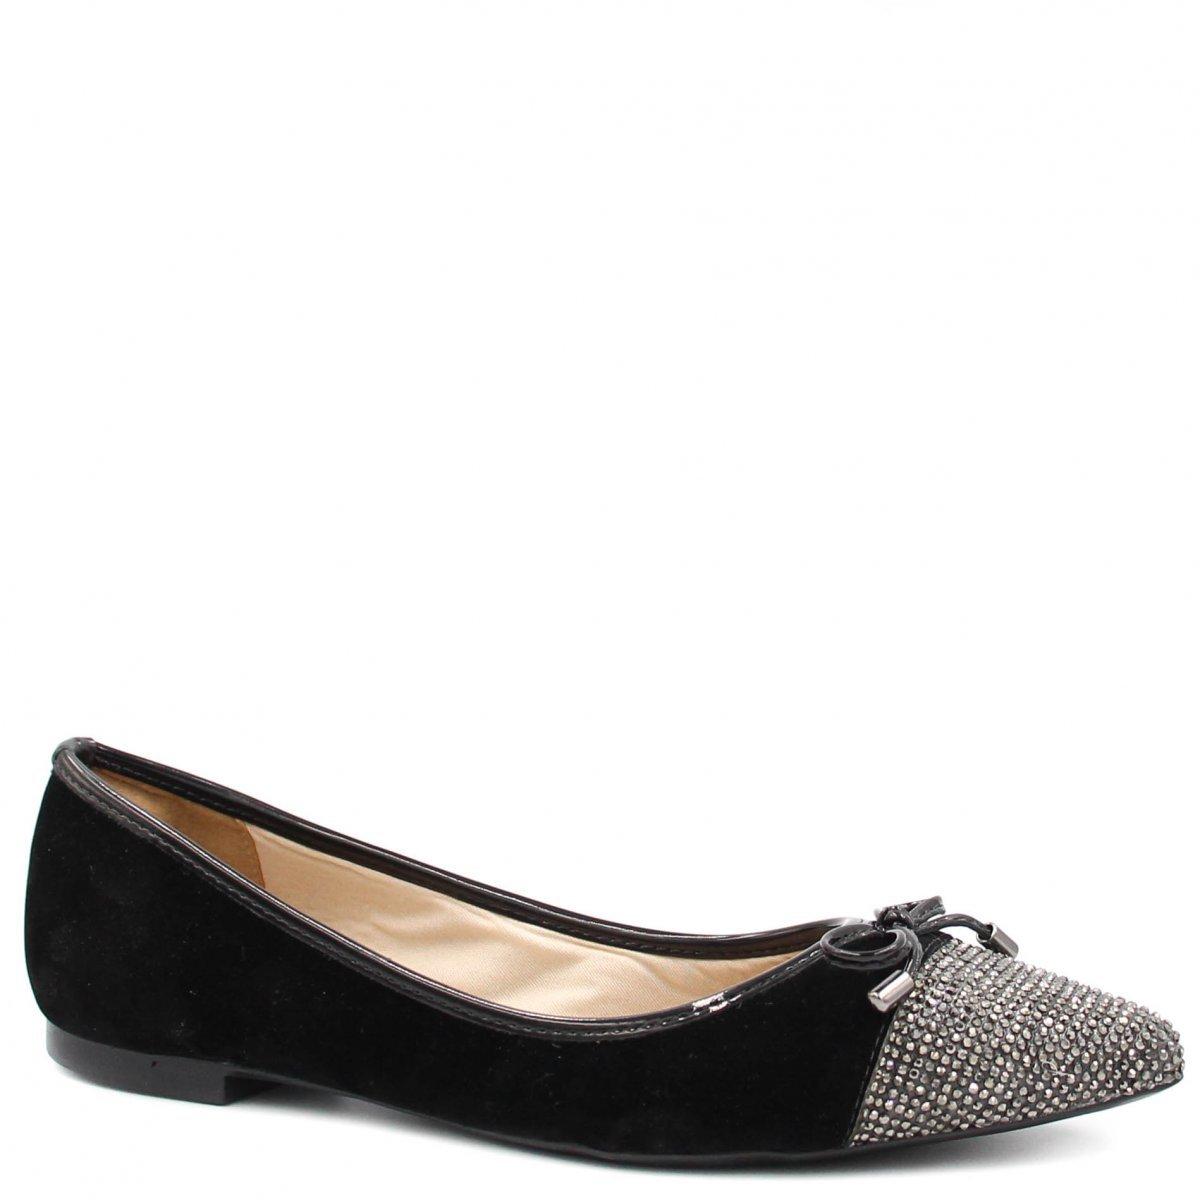 Laço Shoes Sapatilha Sapatilha Preto Zariff Laço Pedras Zariff Shoes Feminino OxZPpw